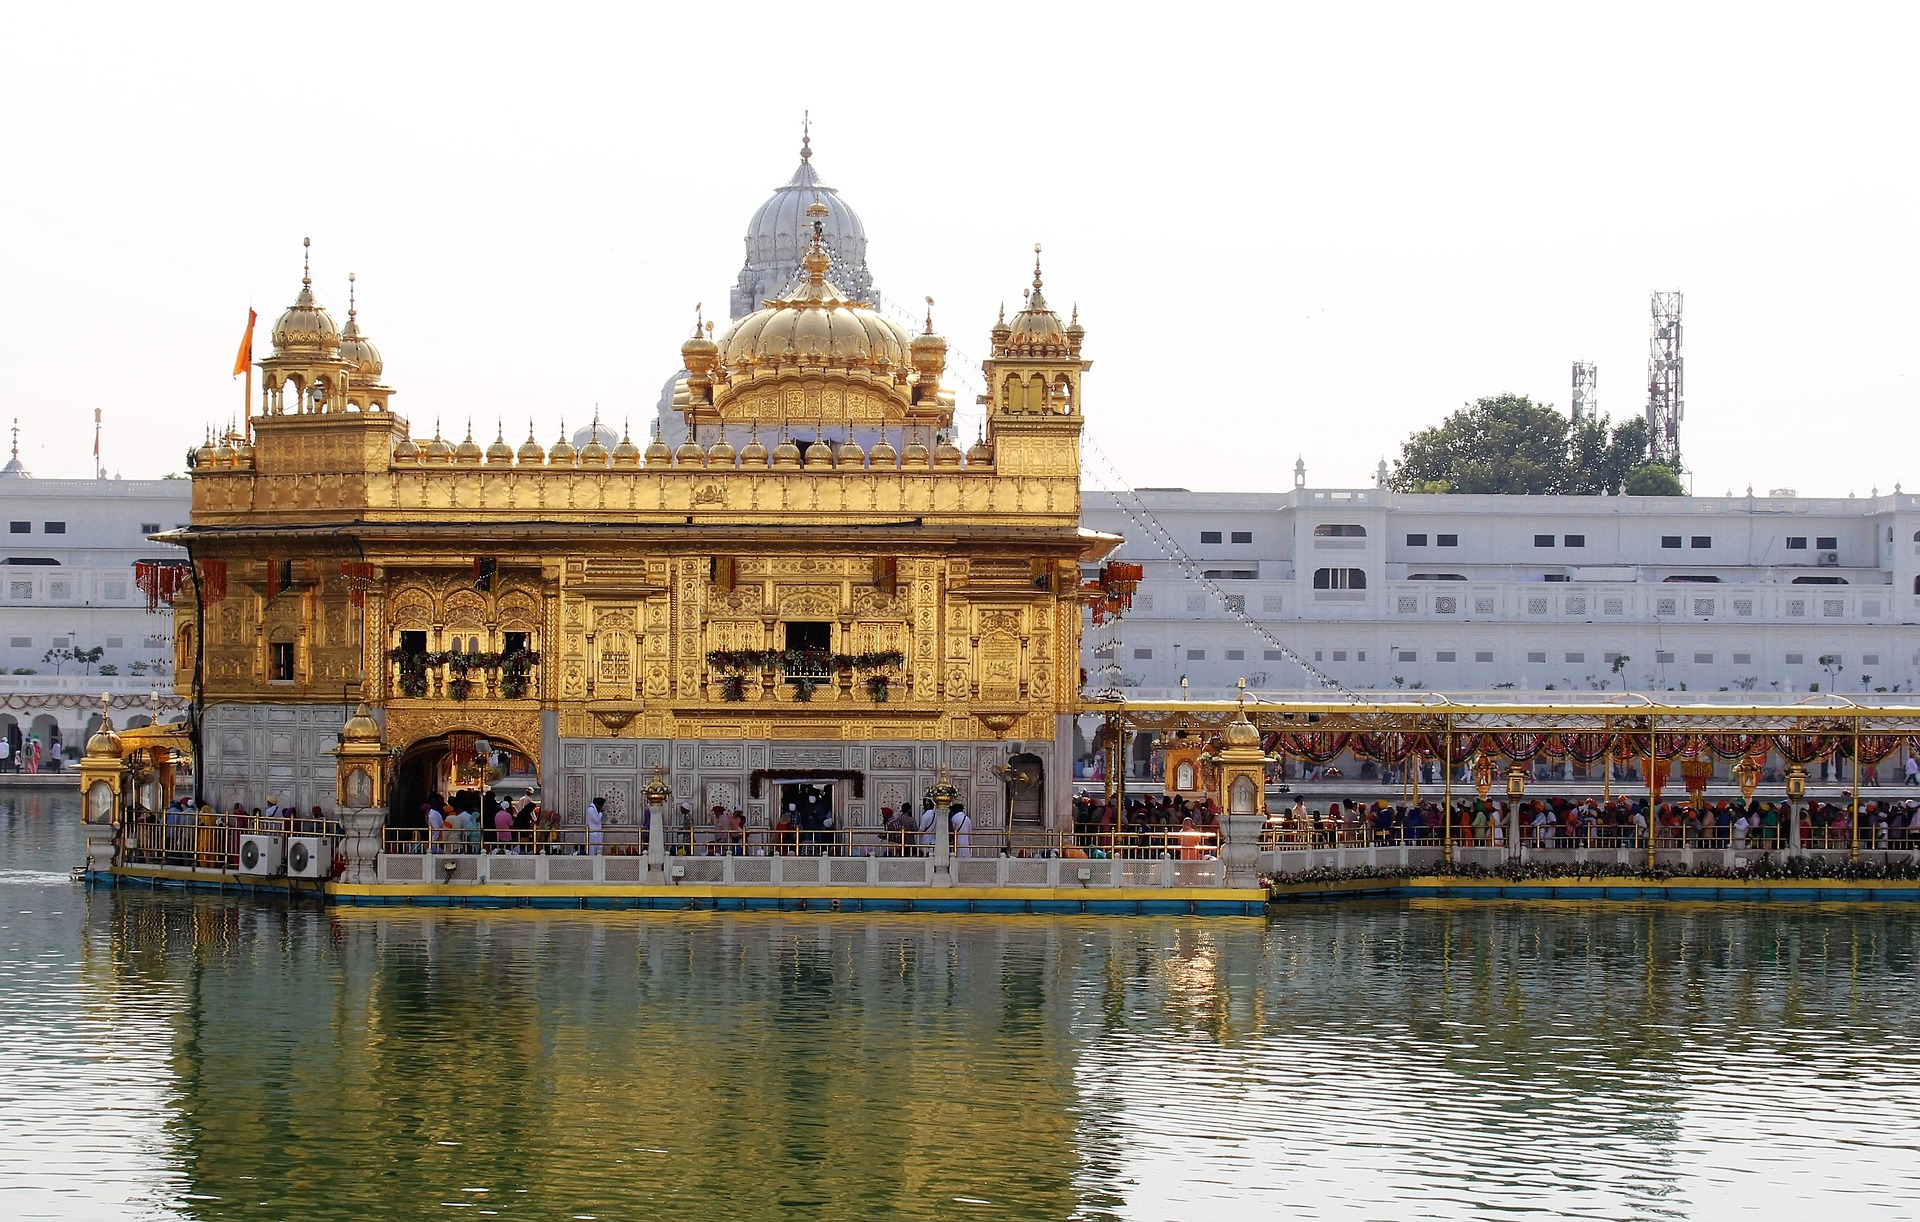 golden-temple-1833064_1920.jpg